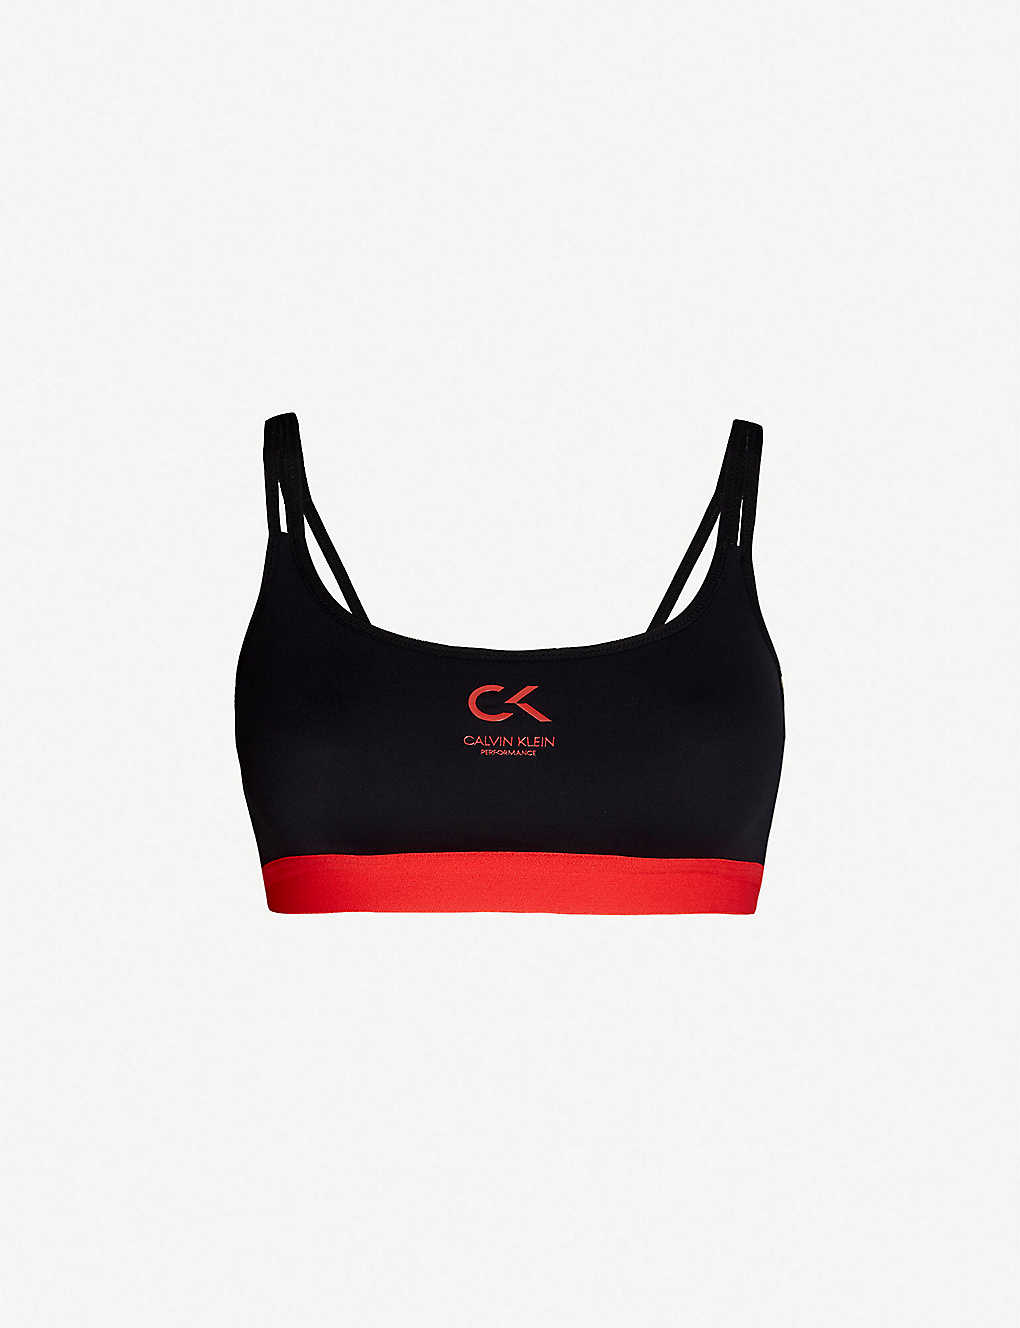 aa8a785f66c7 CALVIN KLEIN - Performance logo-print stretch-jersey sports bra |  Selfridges.com